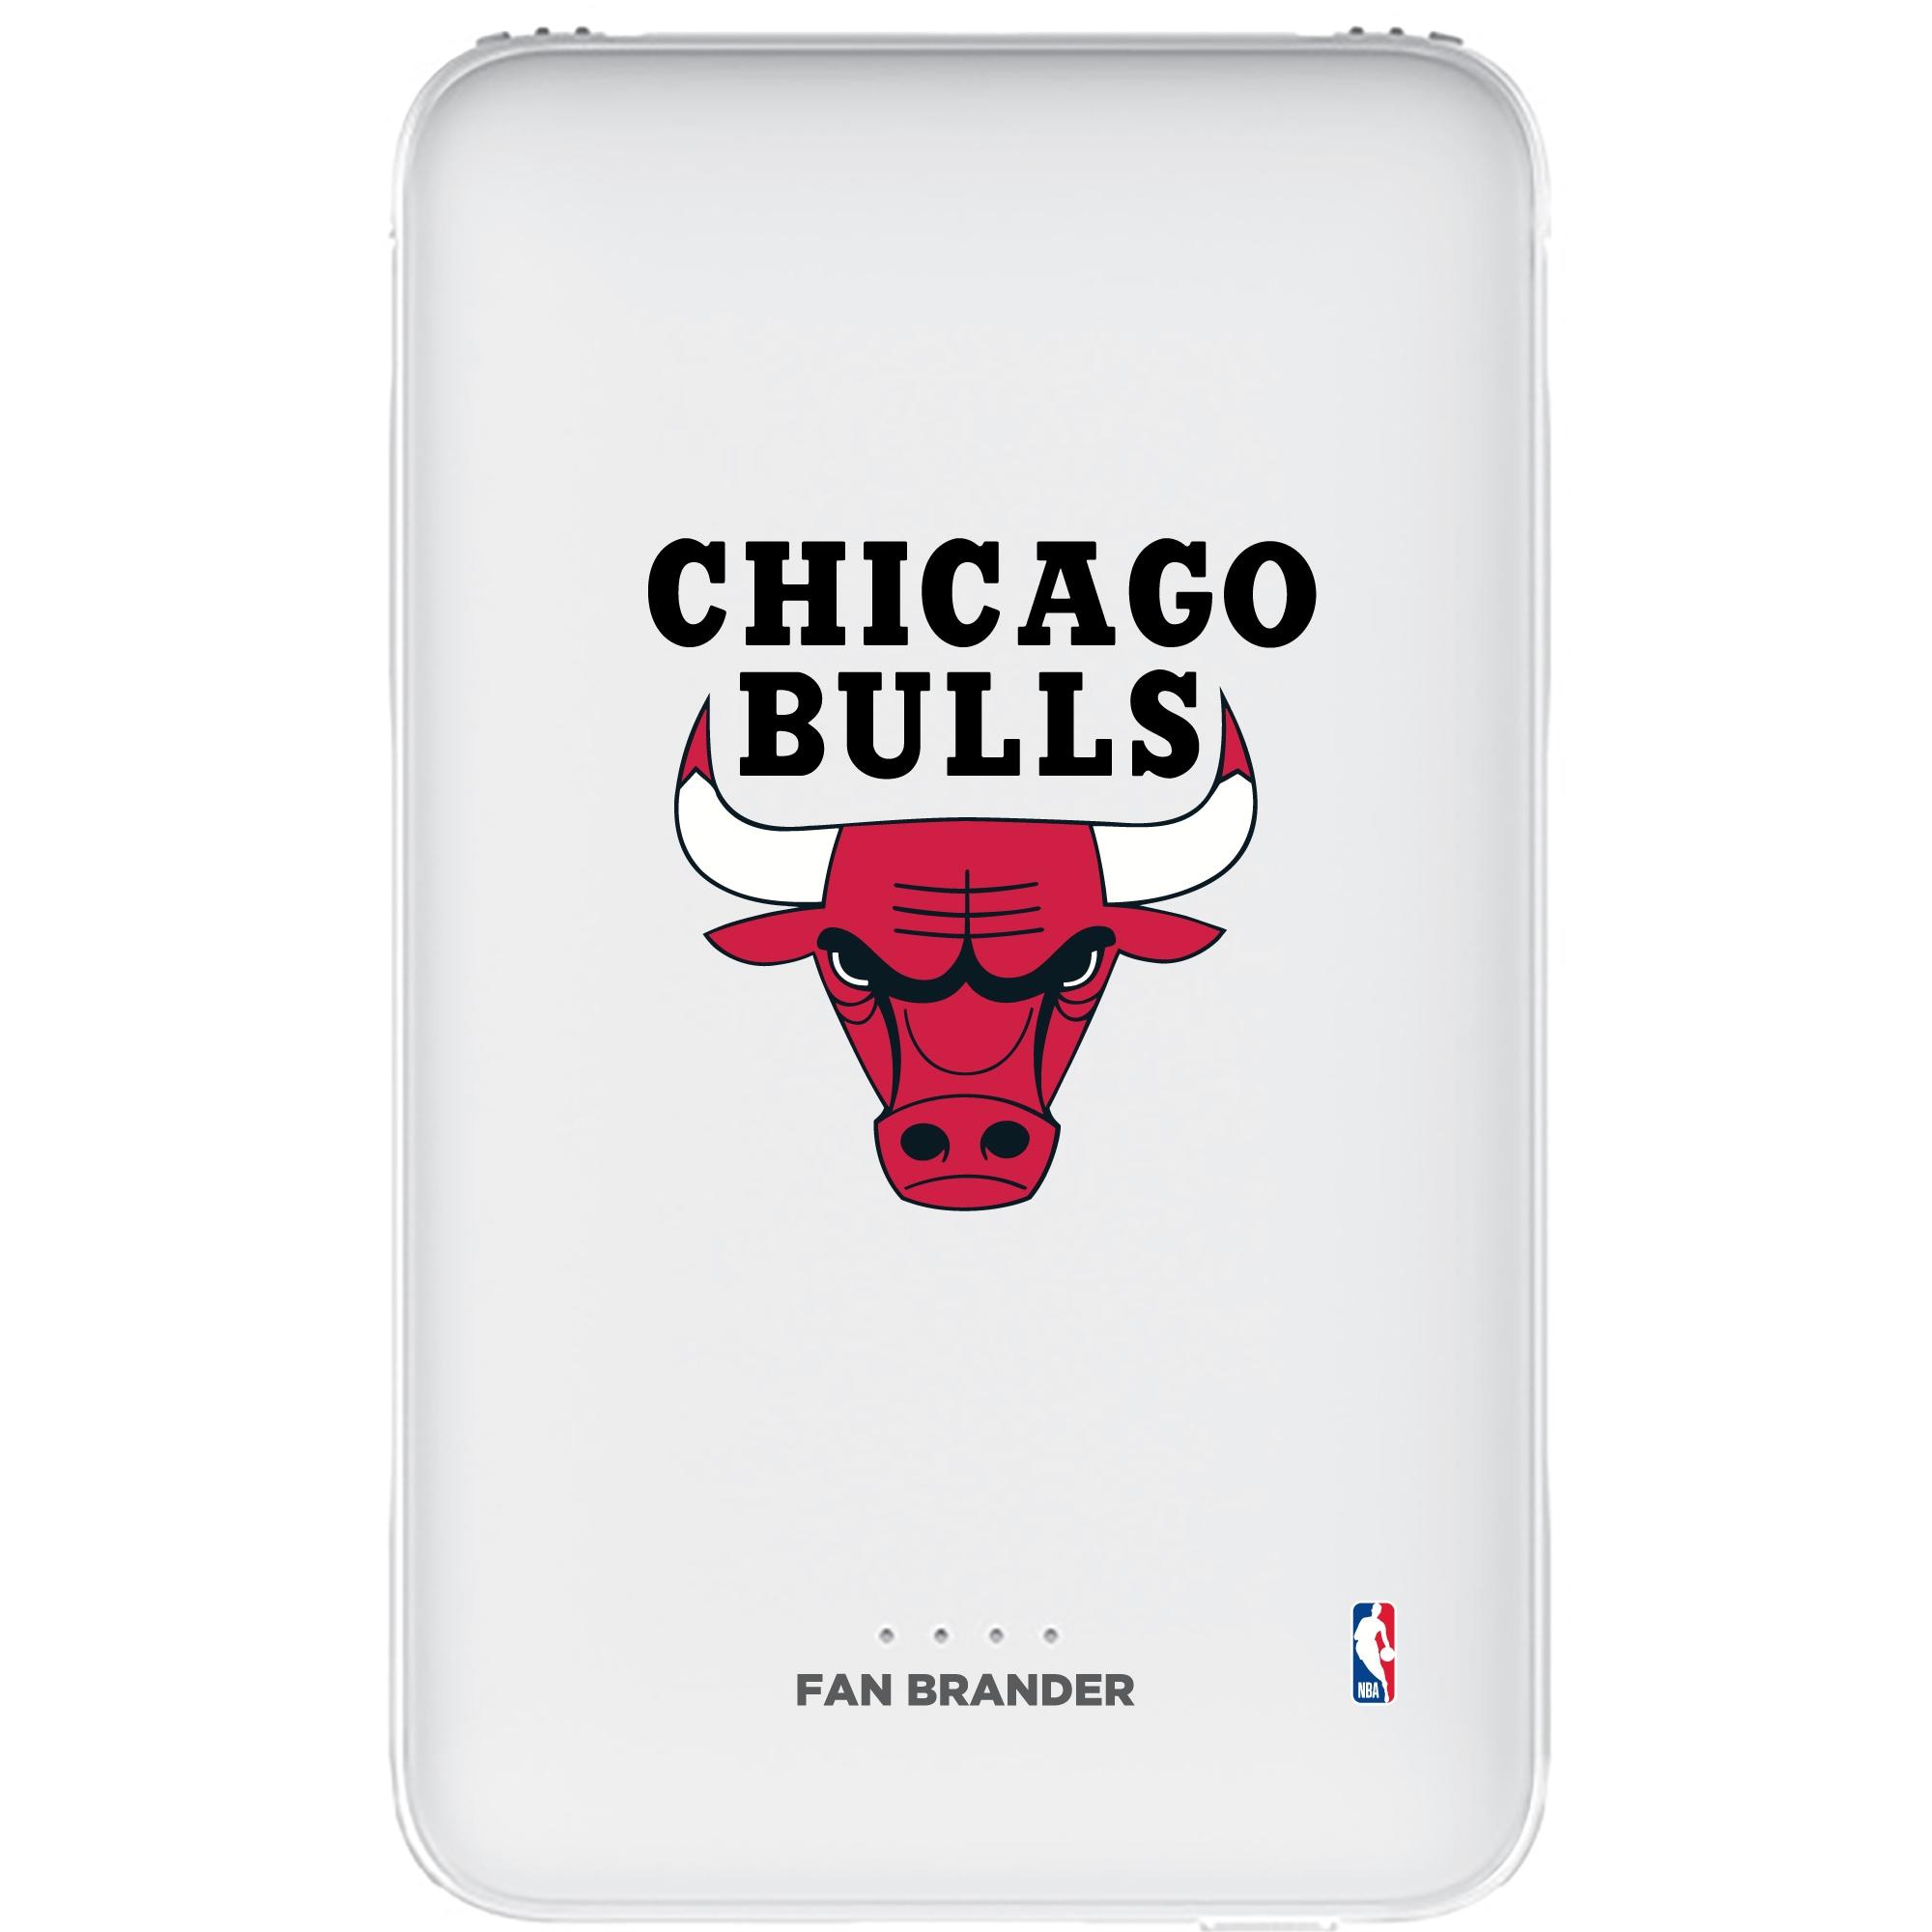 Chicago Bulls 5000mAh Portable Power Bank - White